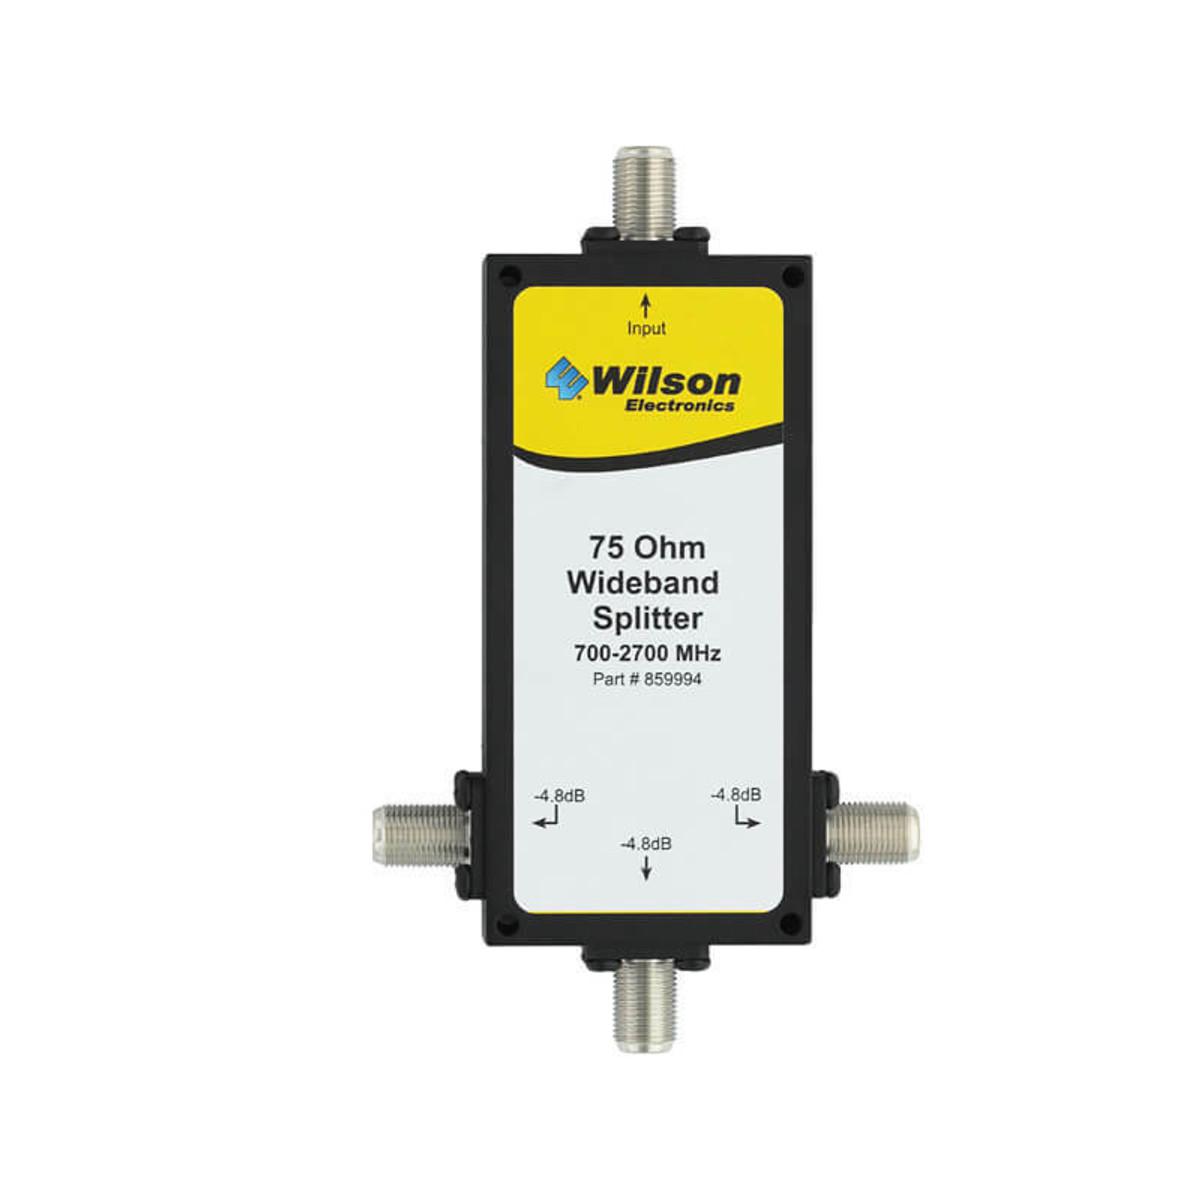 Wilson Electronics Wilson Dual Antenna Expansion Kit 75 Ohm - 309910-75F